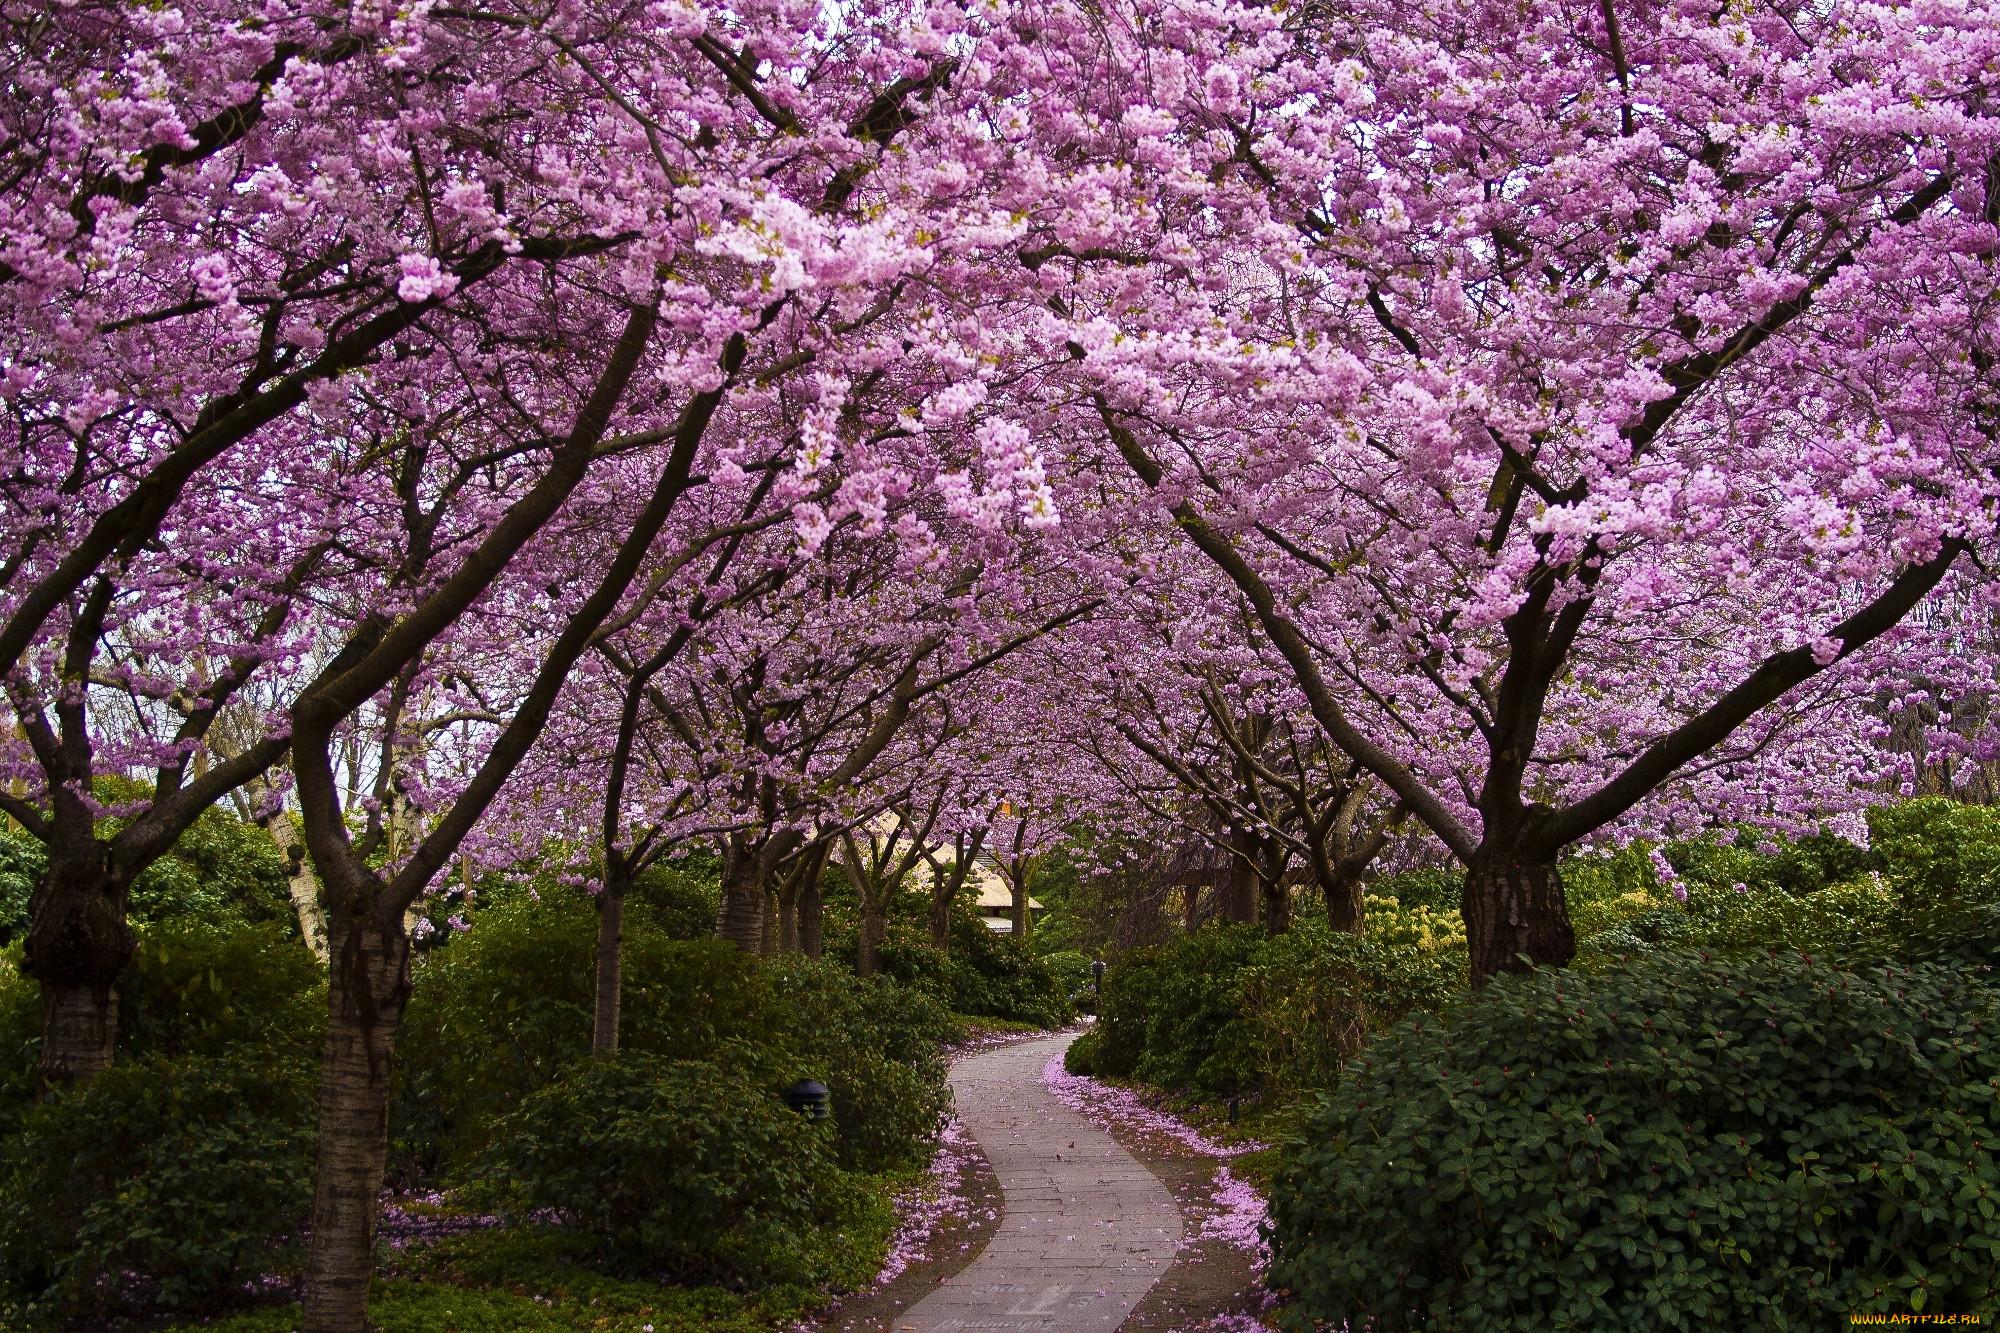 spring wallpaper free - HD1920×1200